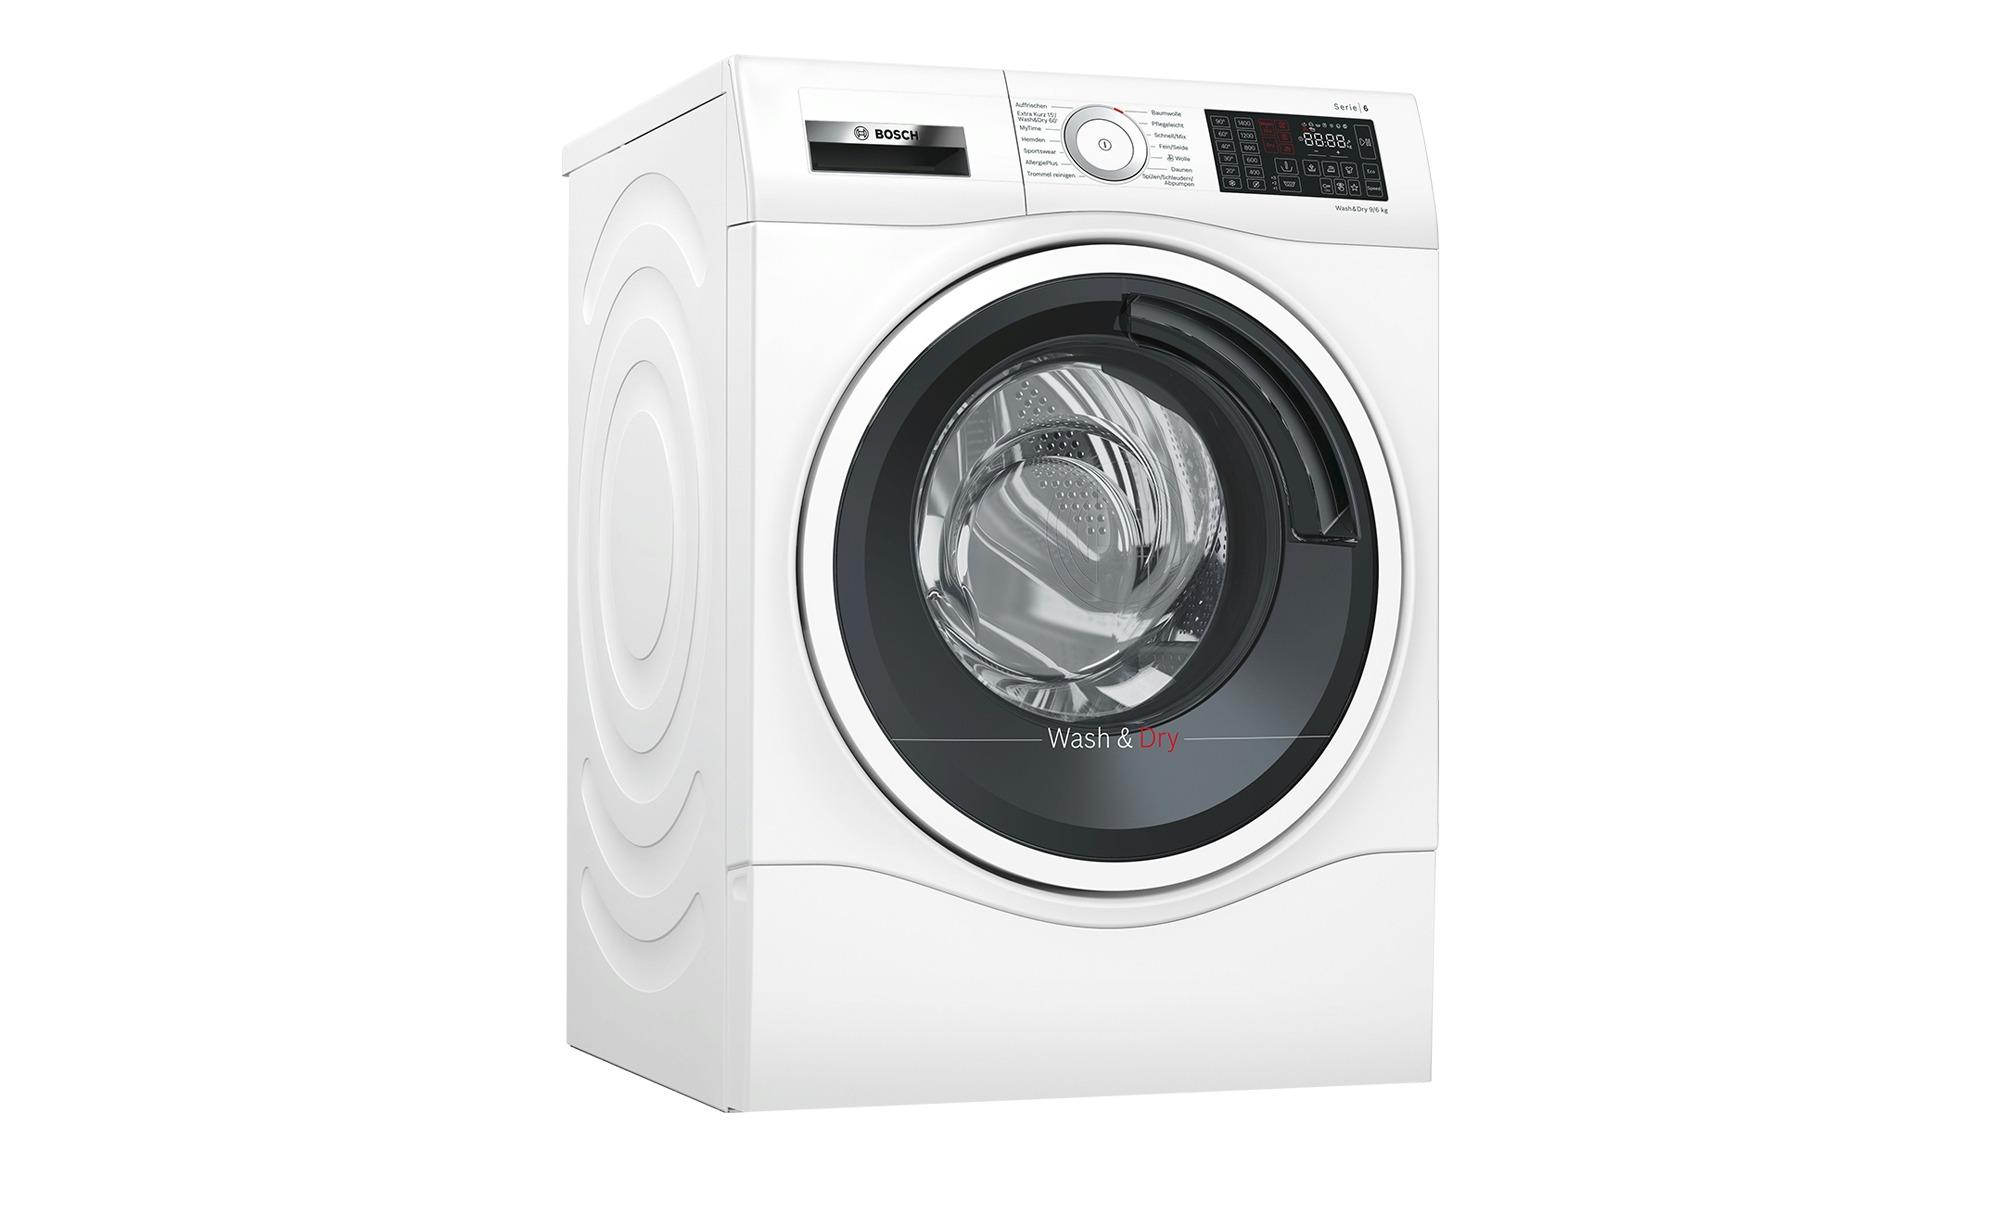 BOSCH Waschtrockner  WDU28540 ¦ weiß ¦ Maße (cm): B: 59,8 H: 84,8 T: 62 Elektrogeräte > Waschtrockner - Höffner | Bad > Waschmaschinen und Trockner > Waschtrockner | Weiß | Möbel Höffner DE